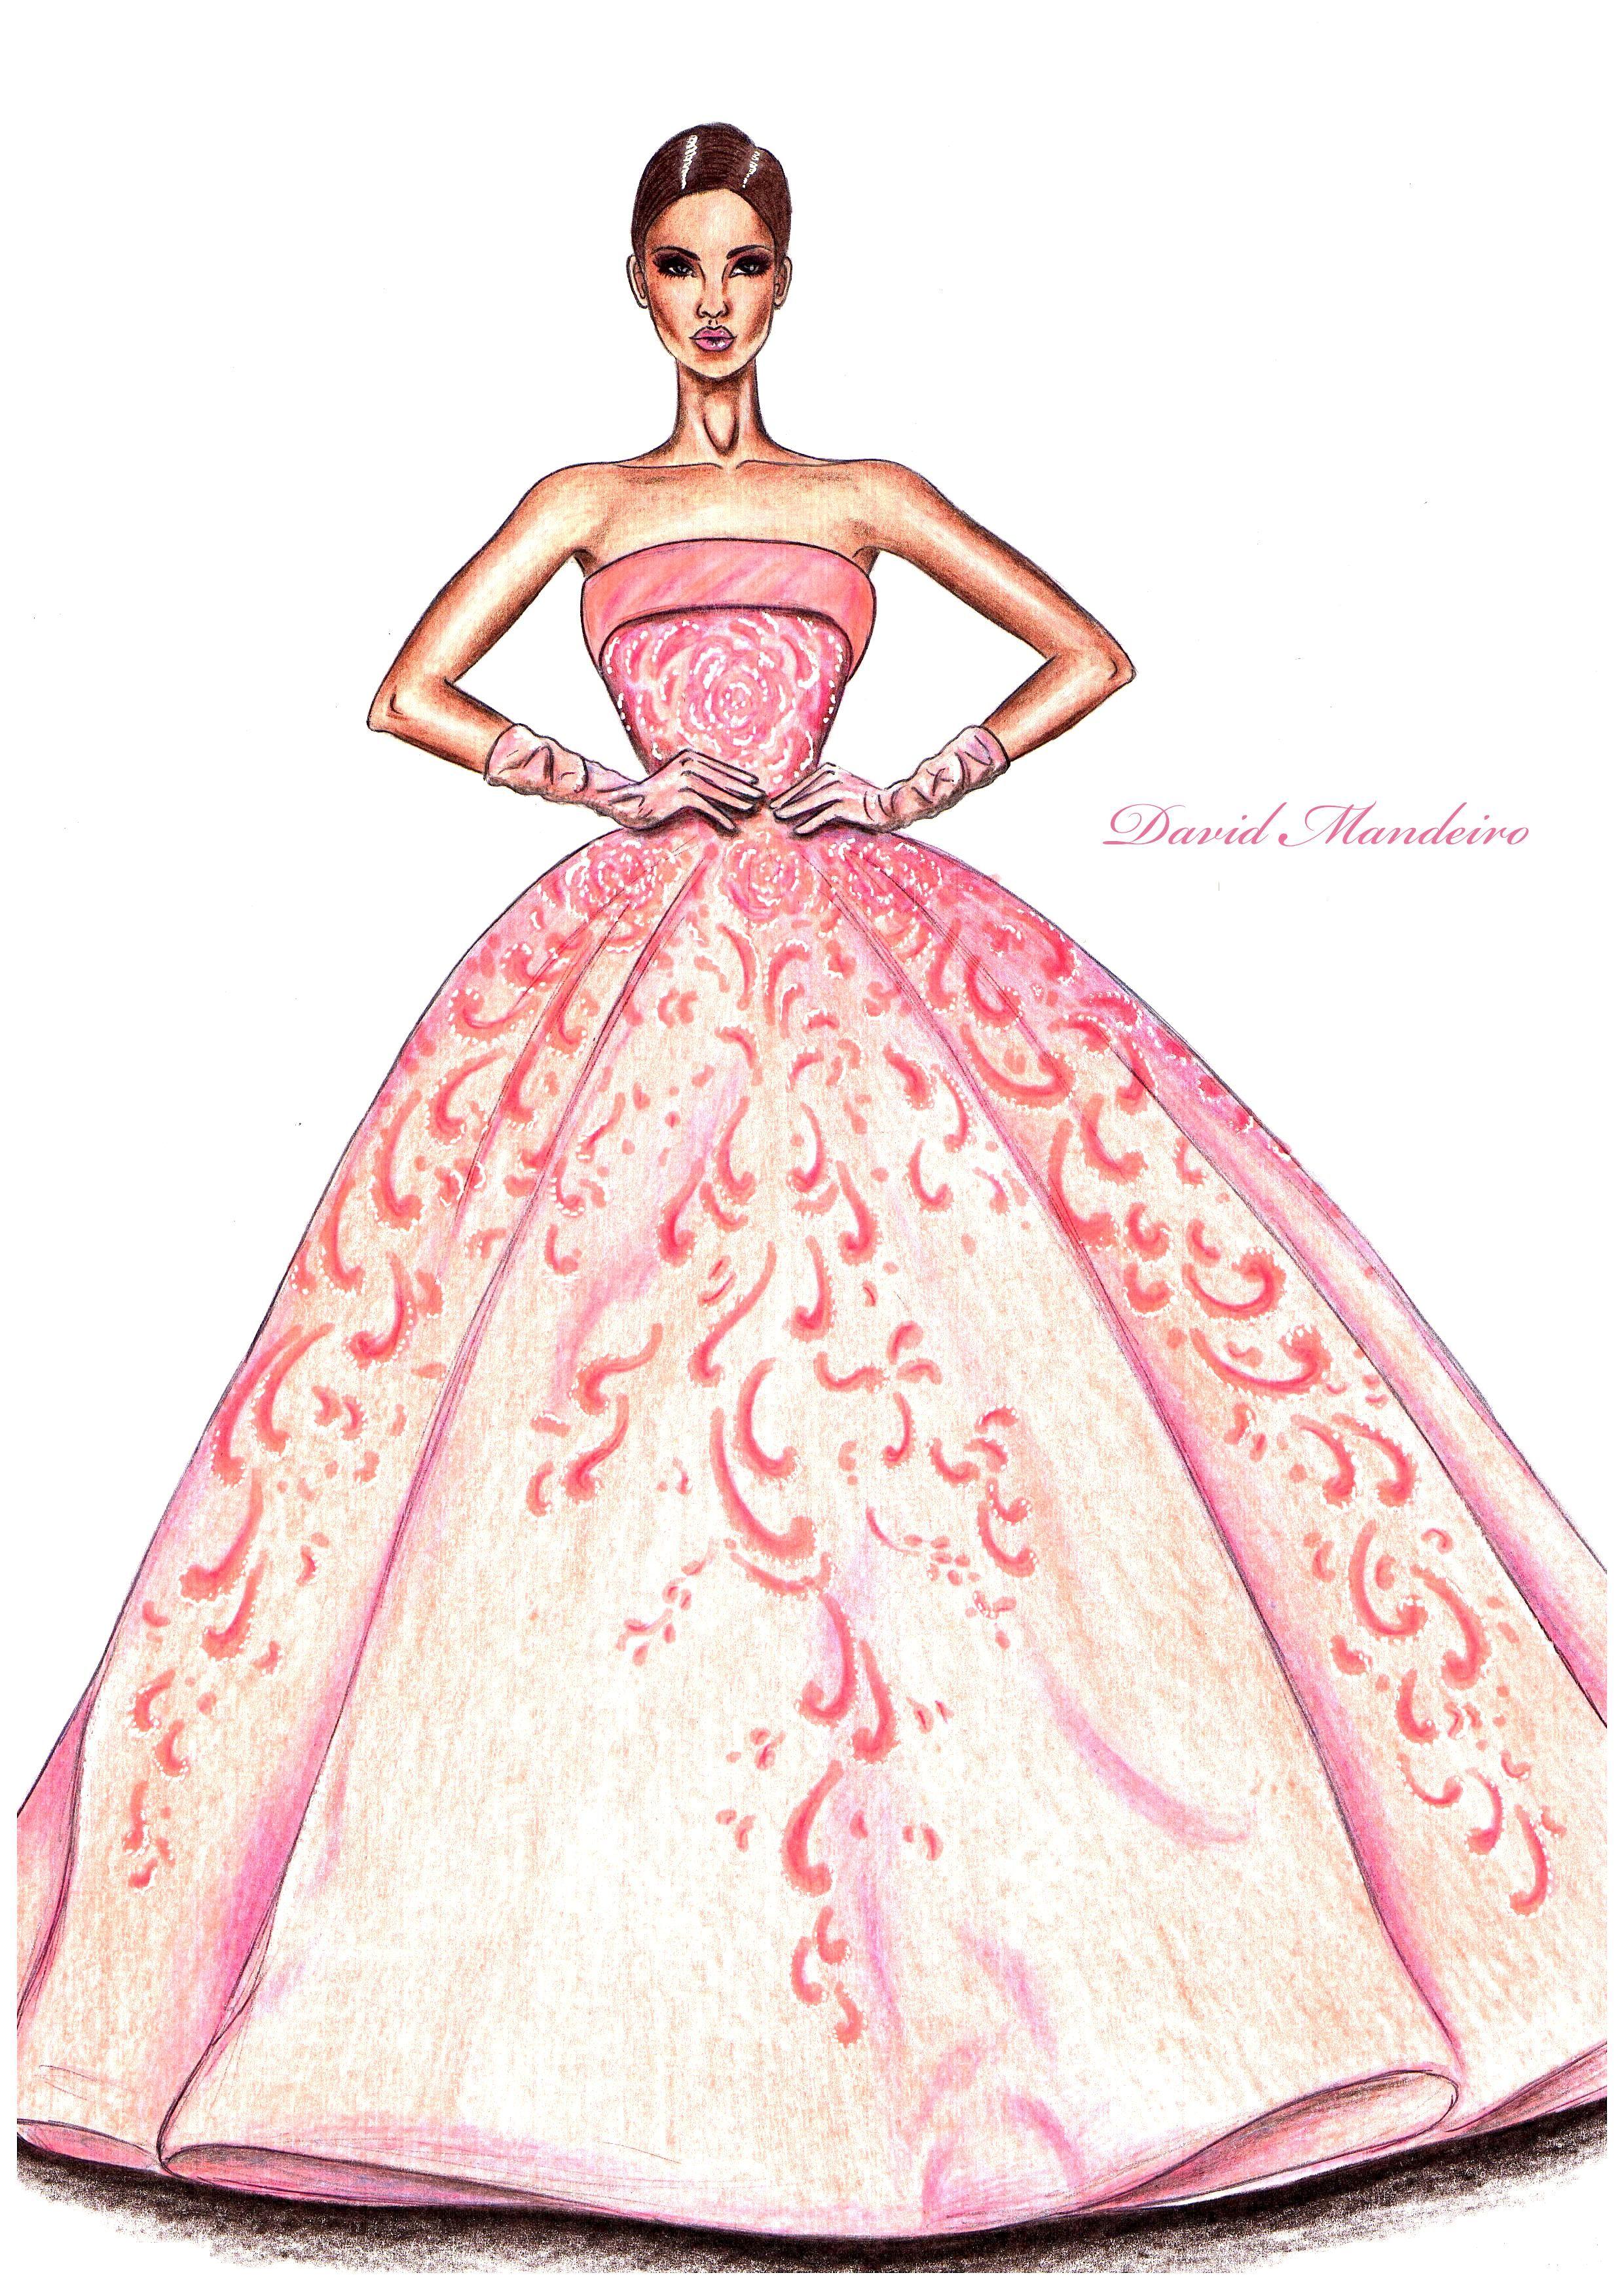 David Mandeiro Illustrations | dolls fashion | Pinterest | Figurin ...